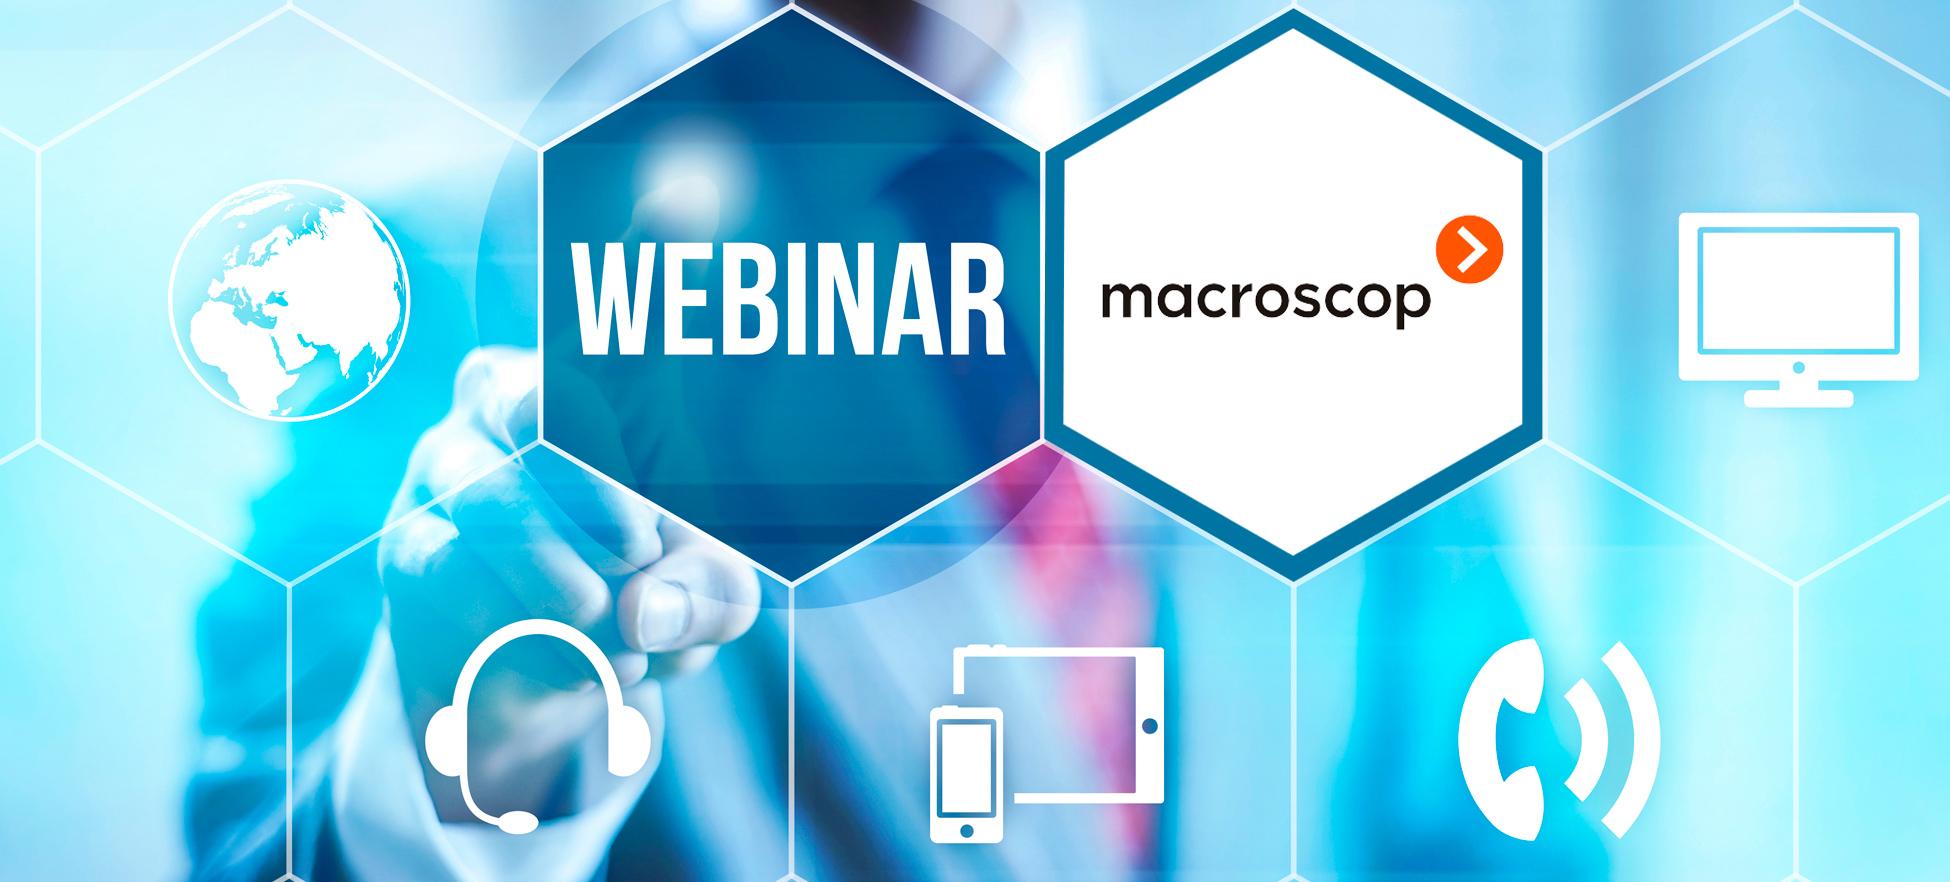 Вебинар — «Новинки Macroscop: модуль распознавания лиц Basic и система 3D подсчёта посетителей».